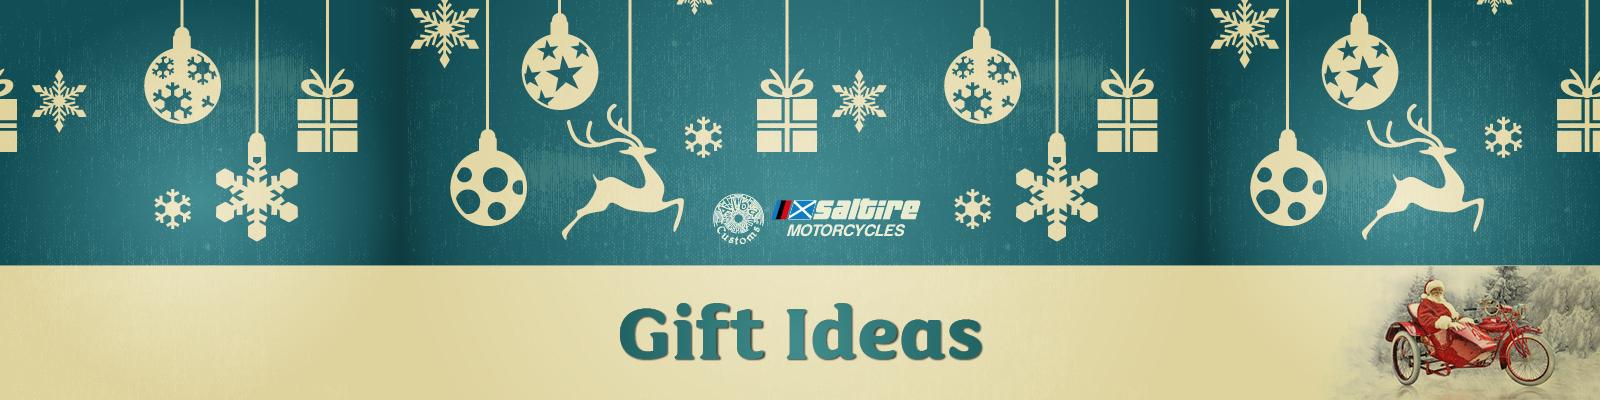 2018 christmas gift ideas 1600x400